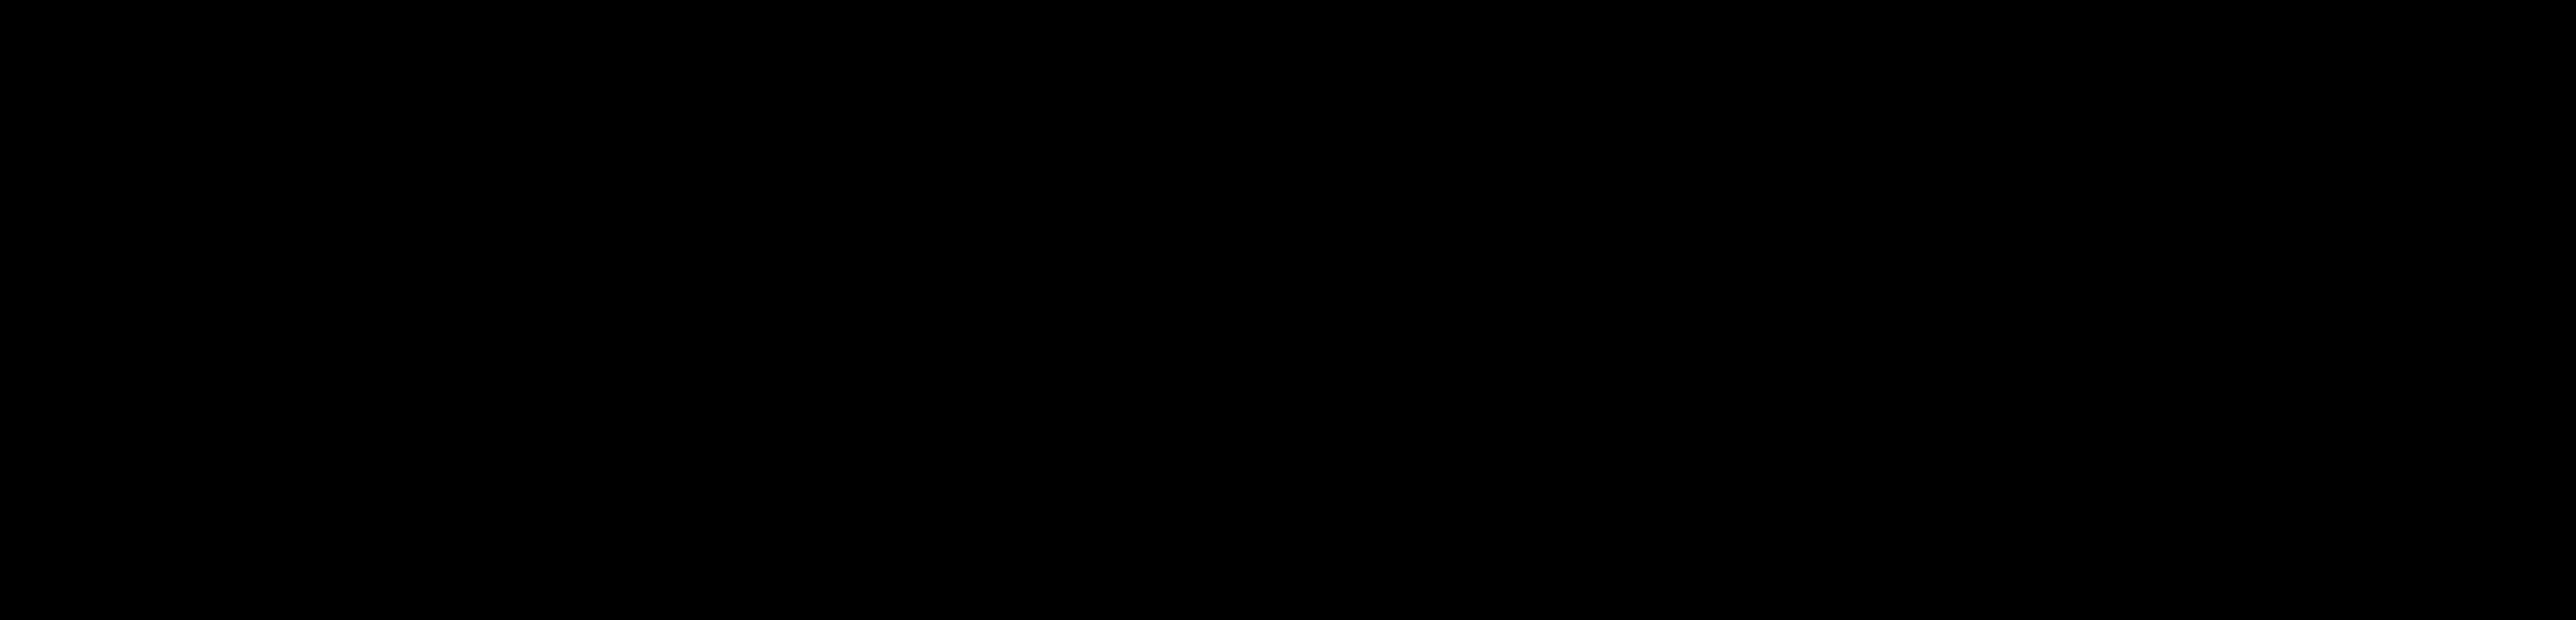 schutz logo - SCHUTZ Logo